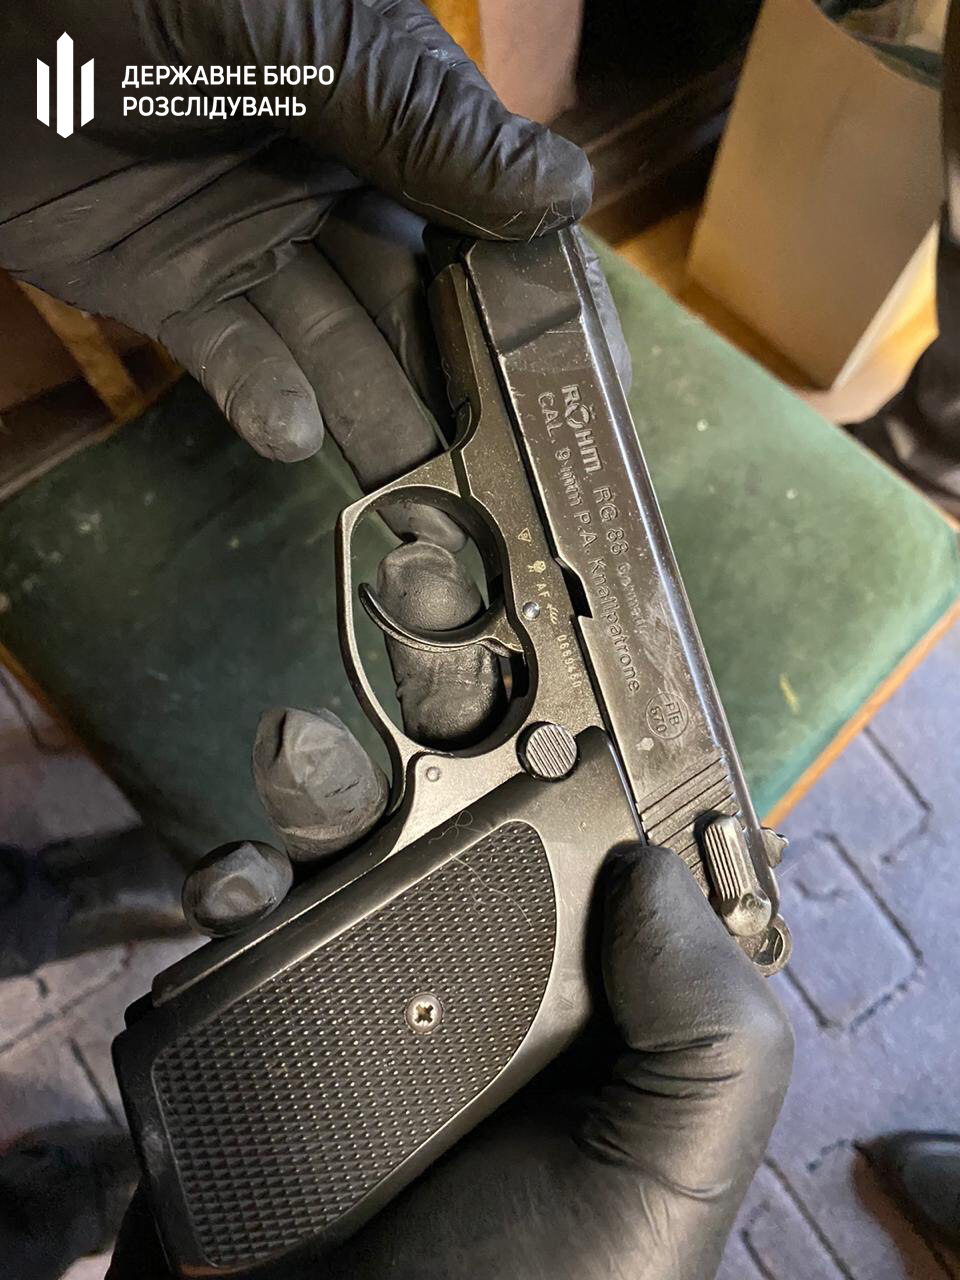 Бориспільщина: у Чорновол при обшуку знайшли вогнепальну та холодну зброю -  - 003 1